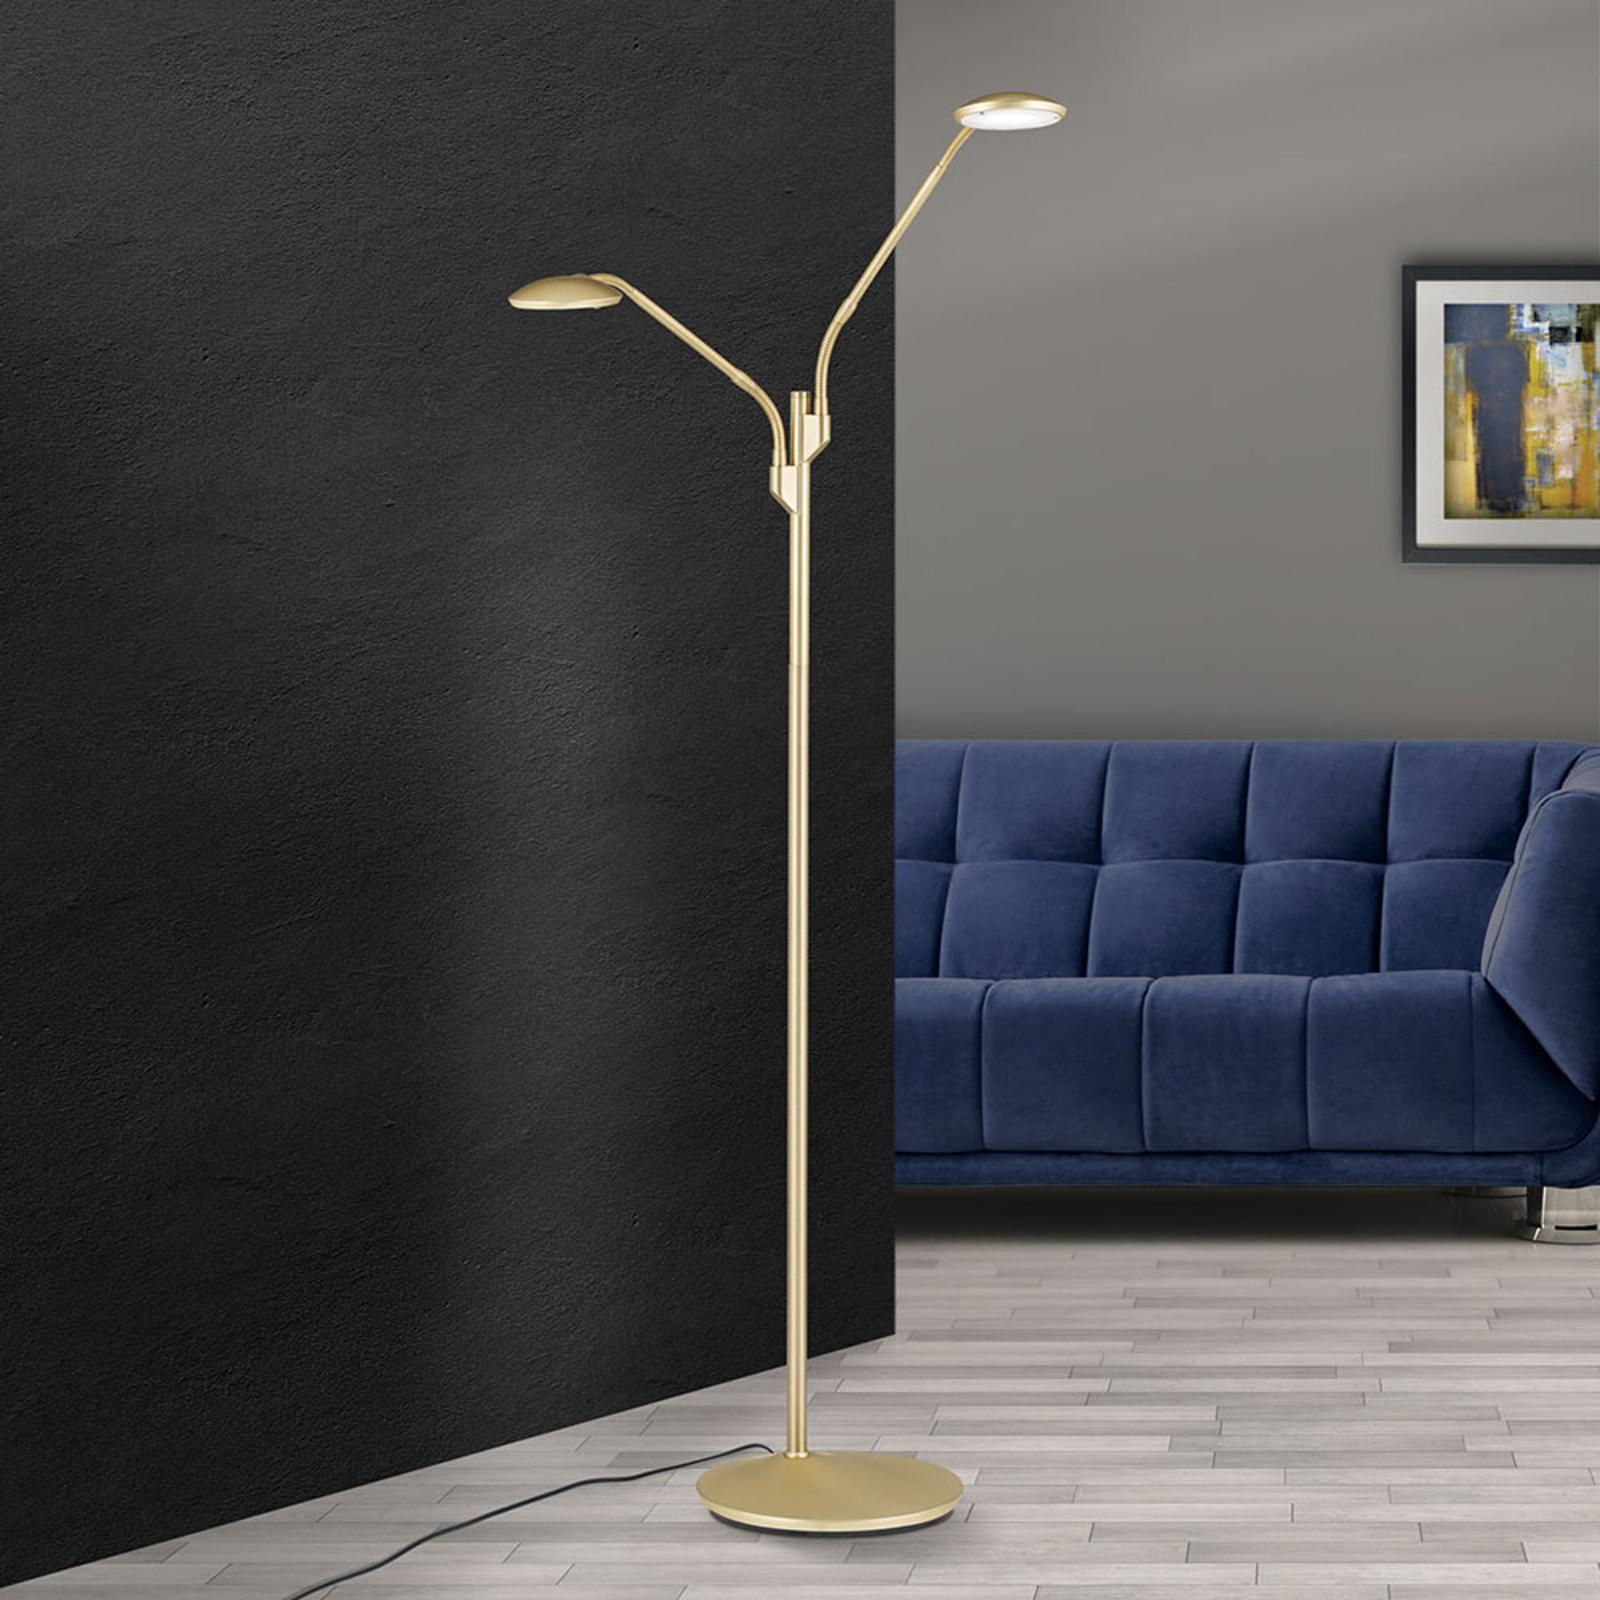 Cobra LED-gulvlampe, 2 lyskilder, mat messing